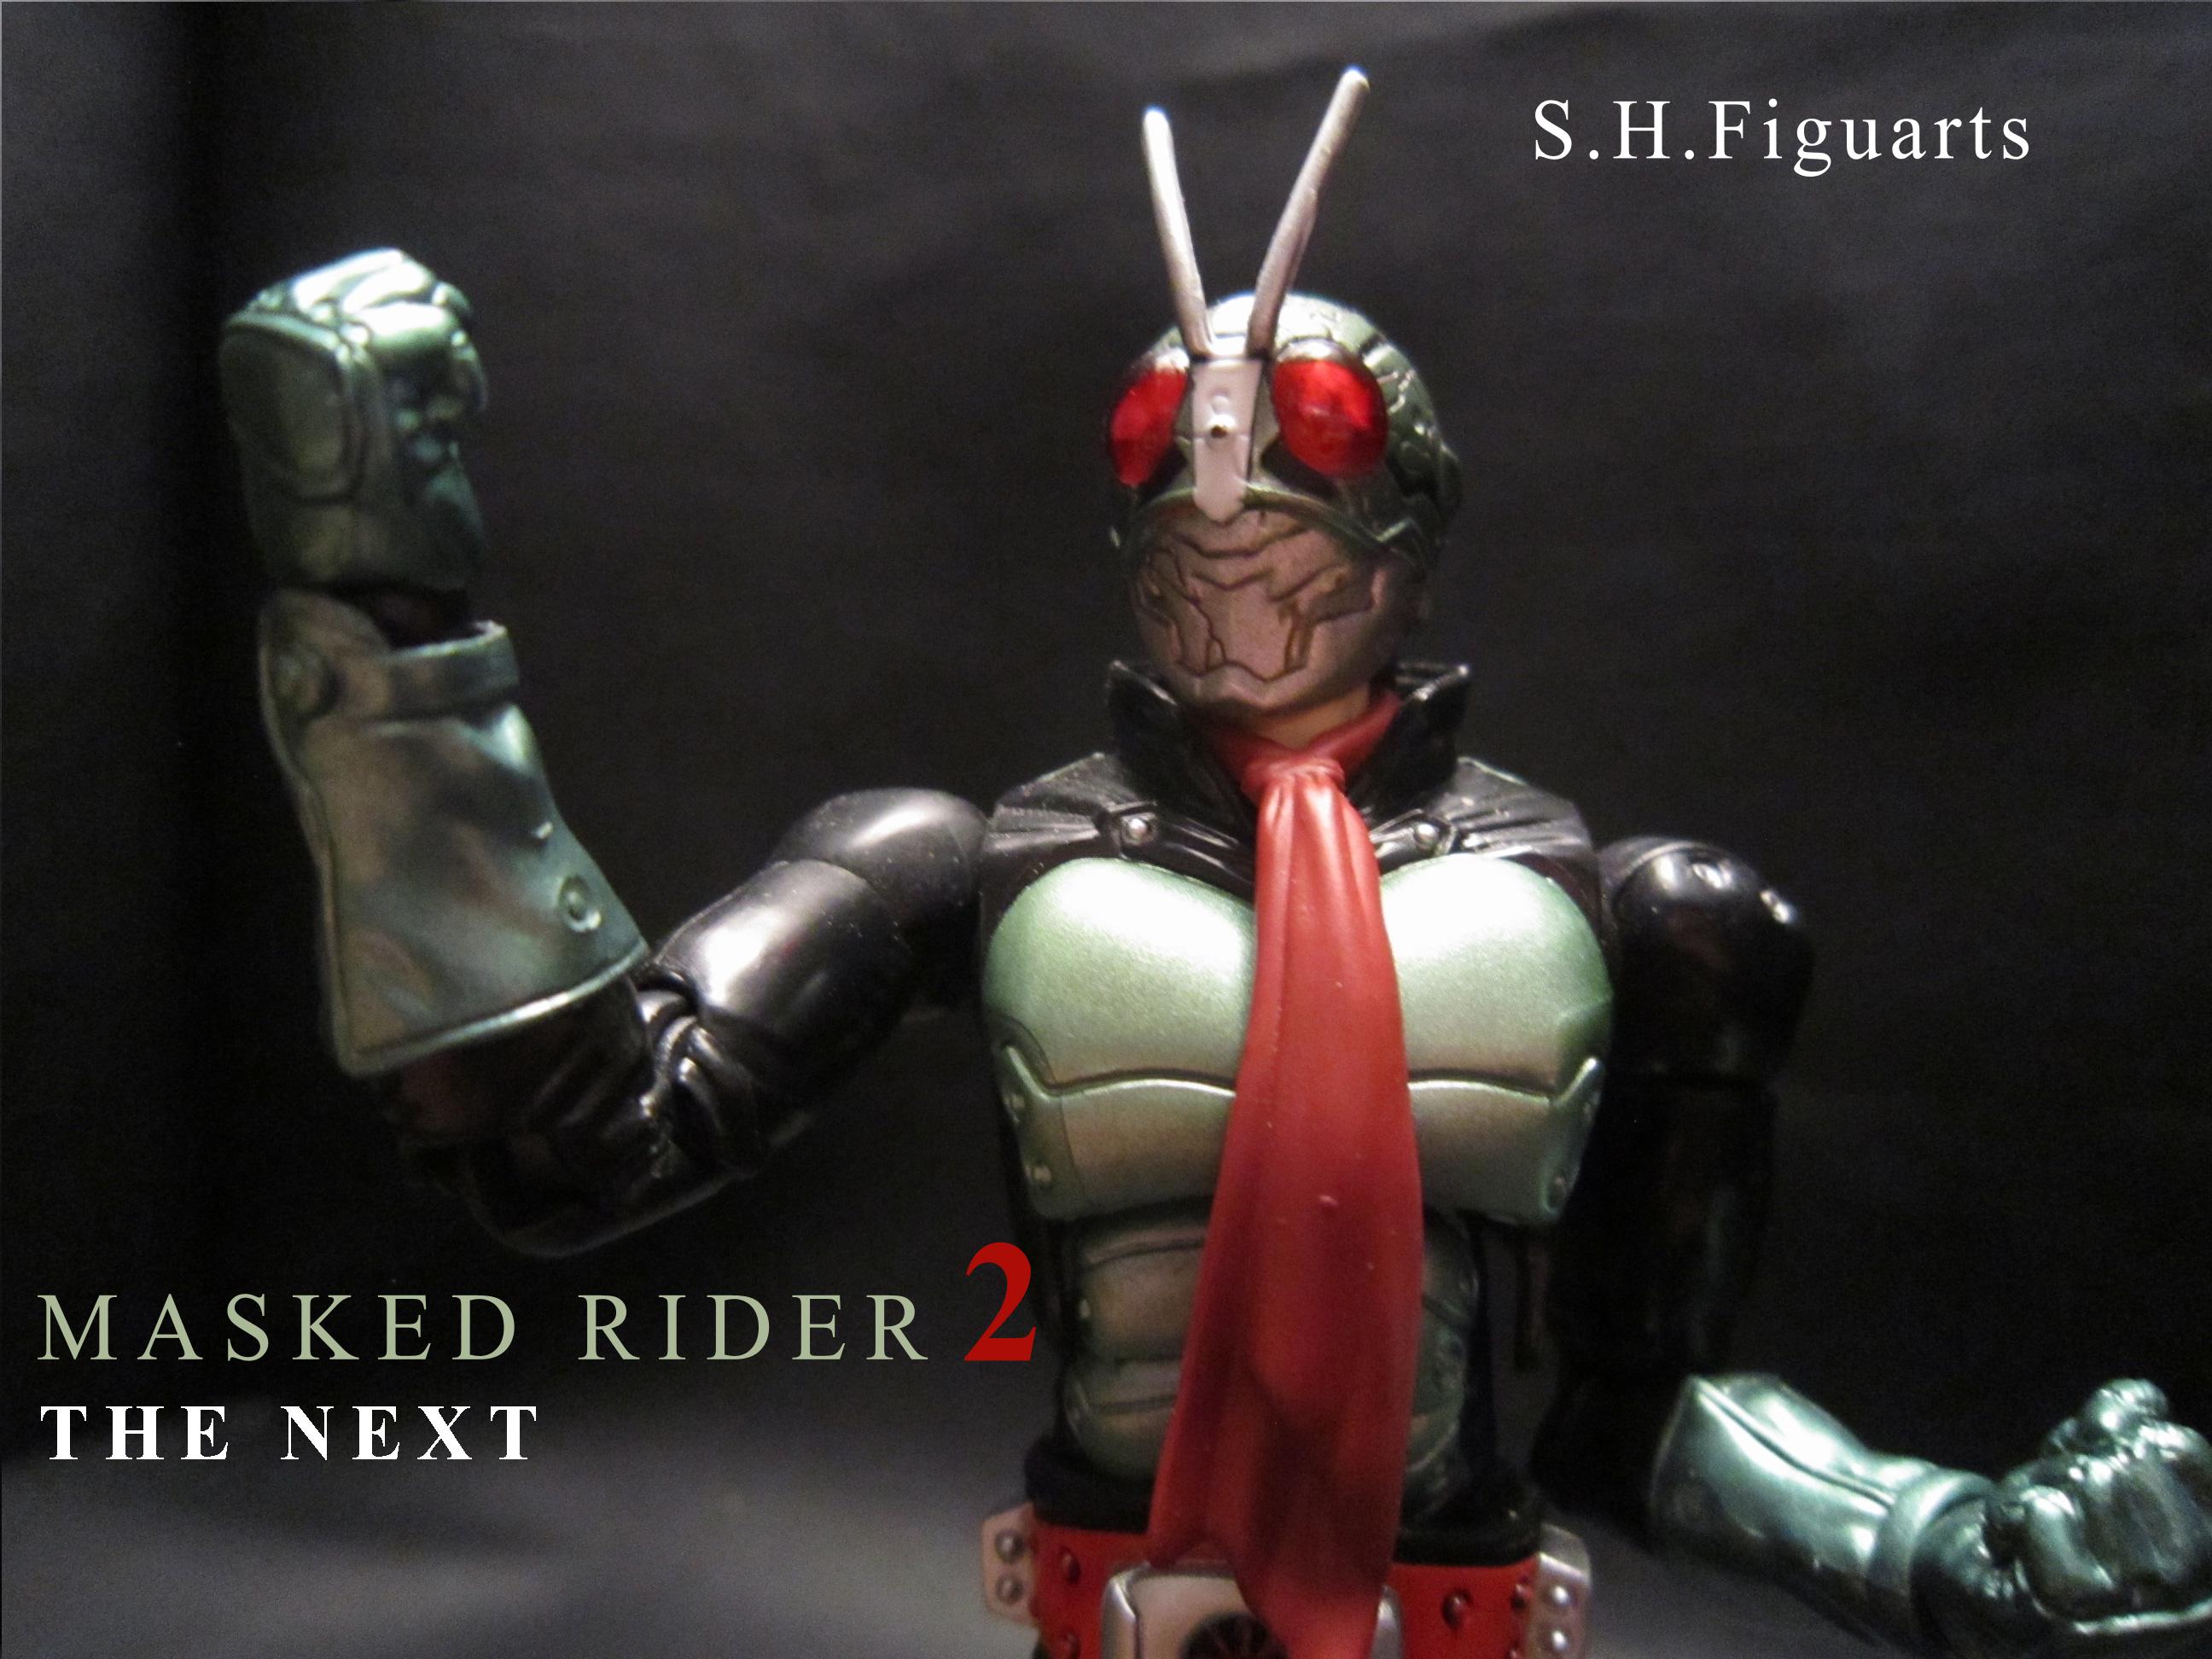 S.H.Figuarts 仮面ライダー2号 THE NEXT版